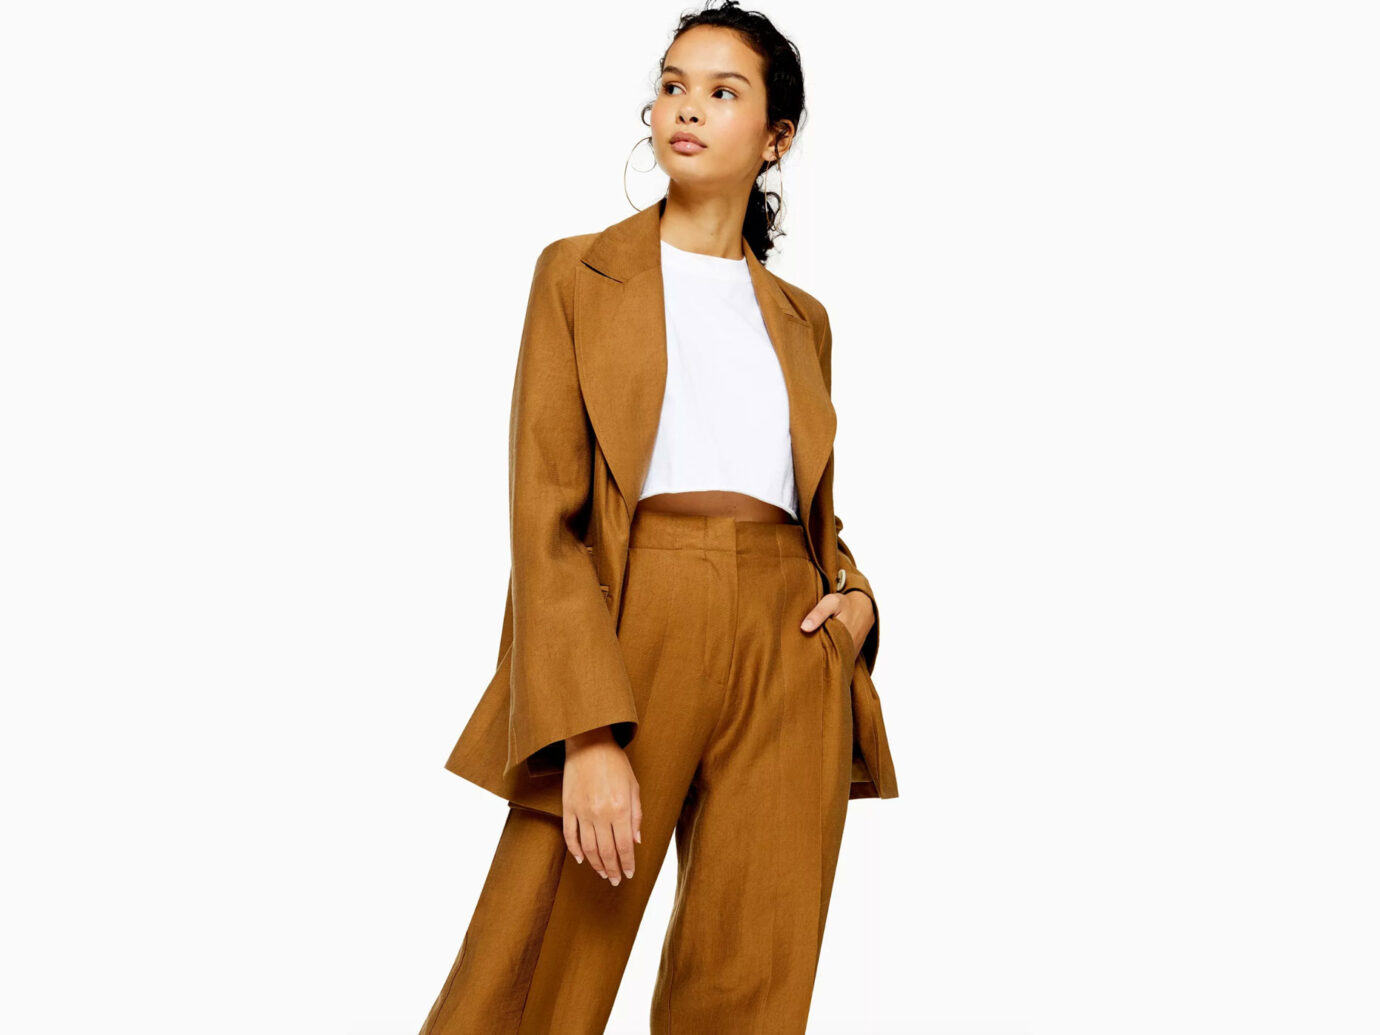 Topshop Dark Camel Raw Hem Single Breasted Suit